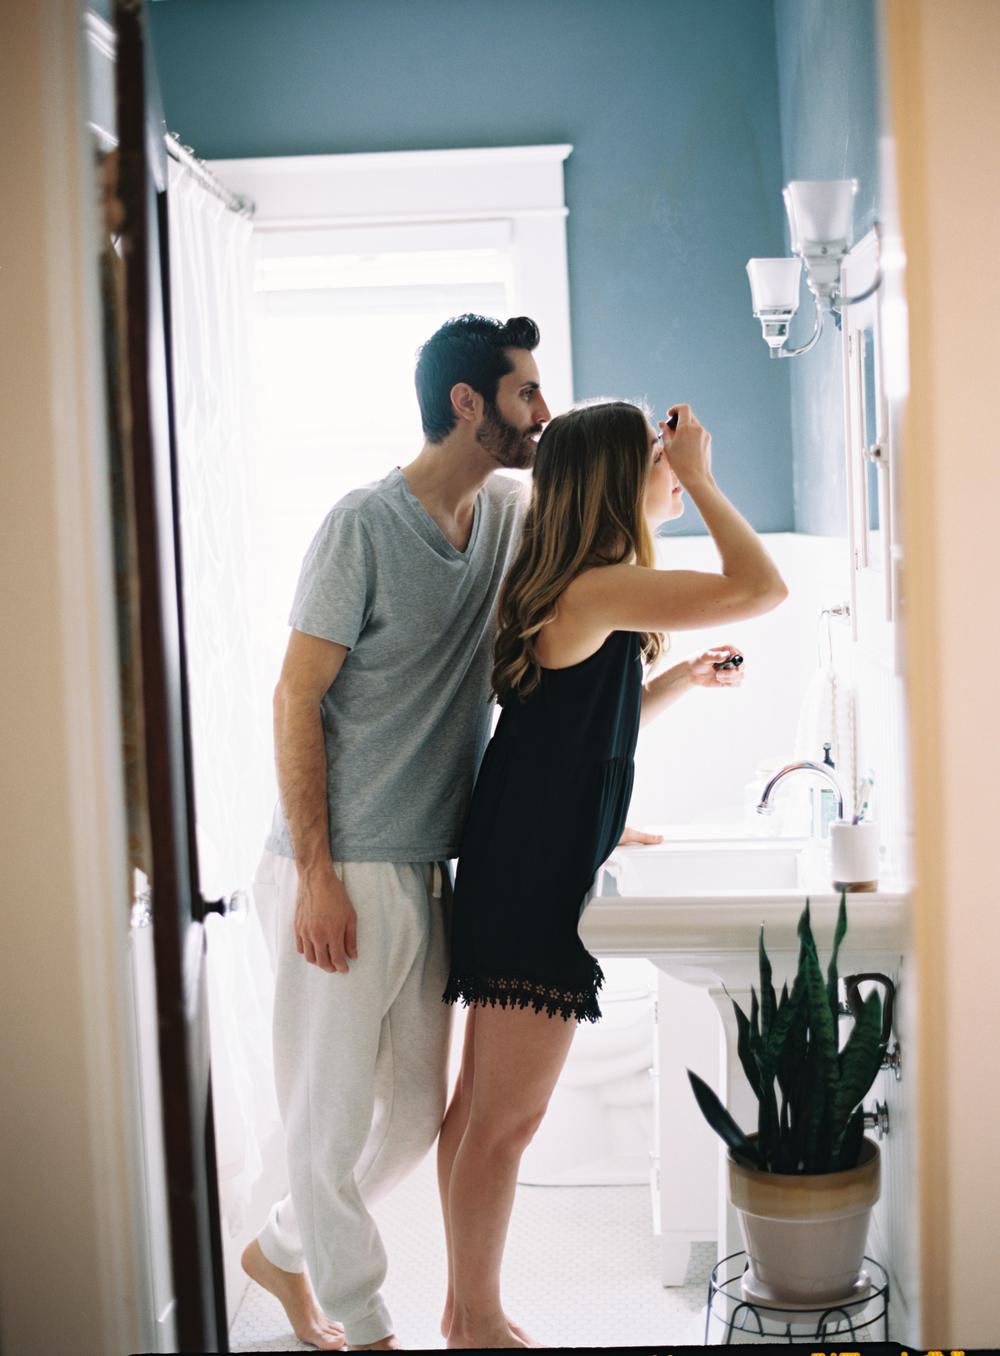 Bathroom_0004.jpg